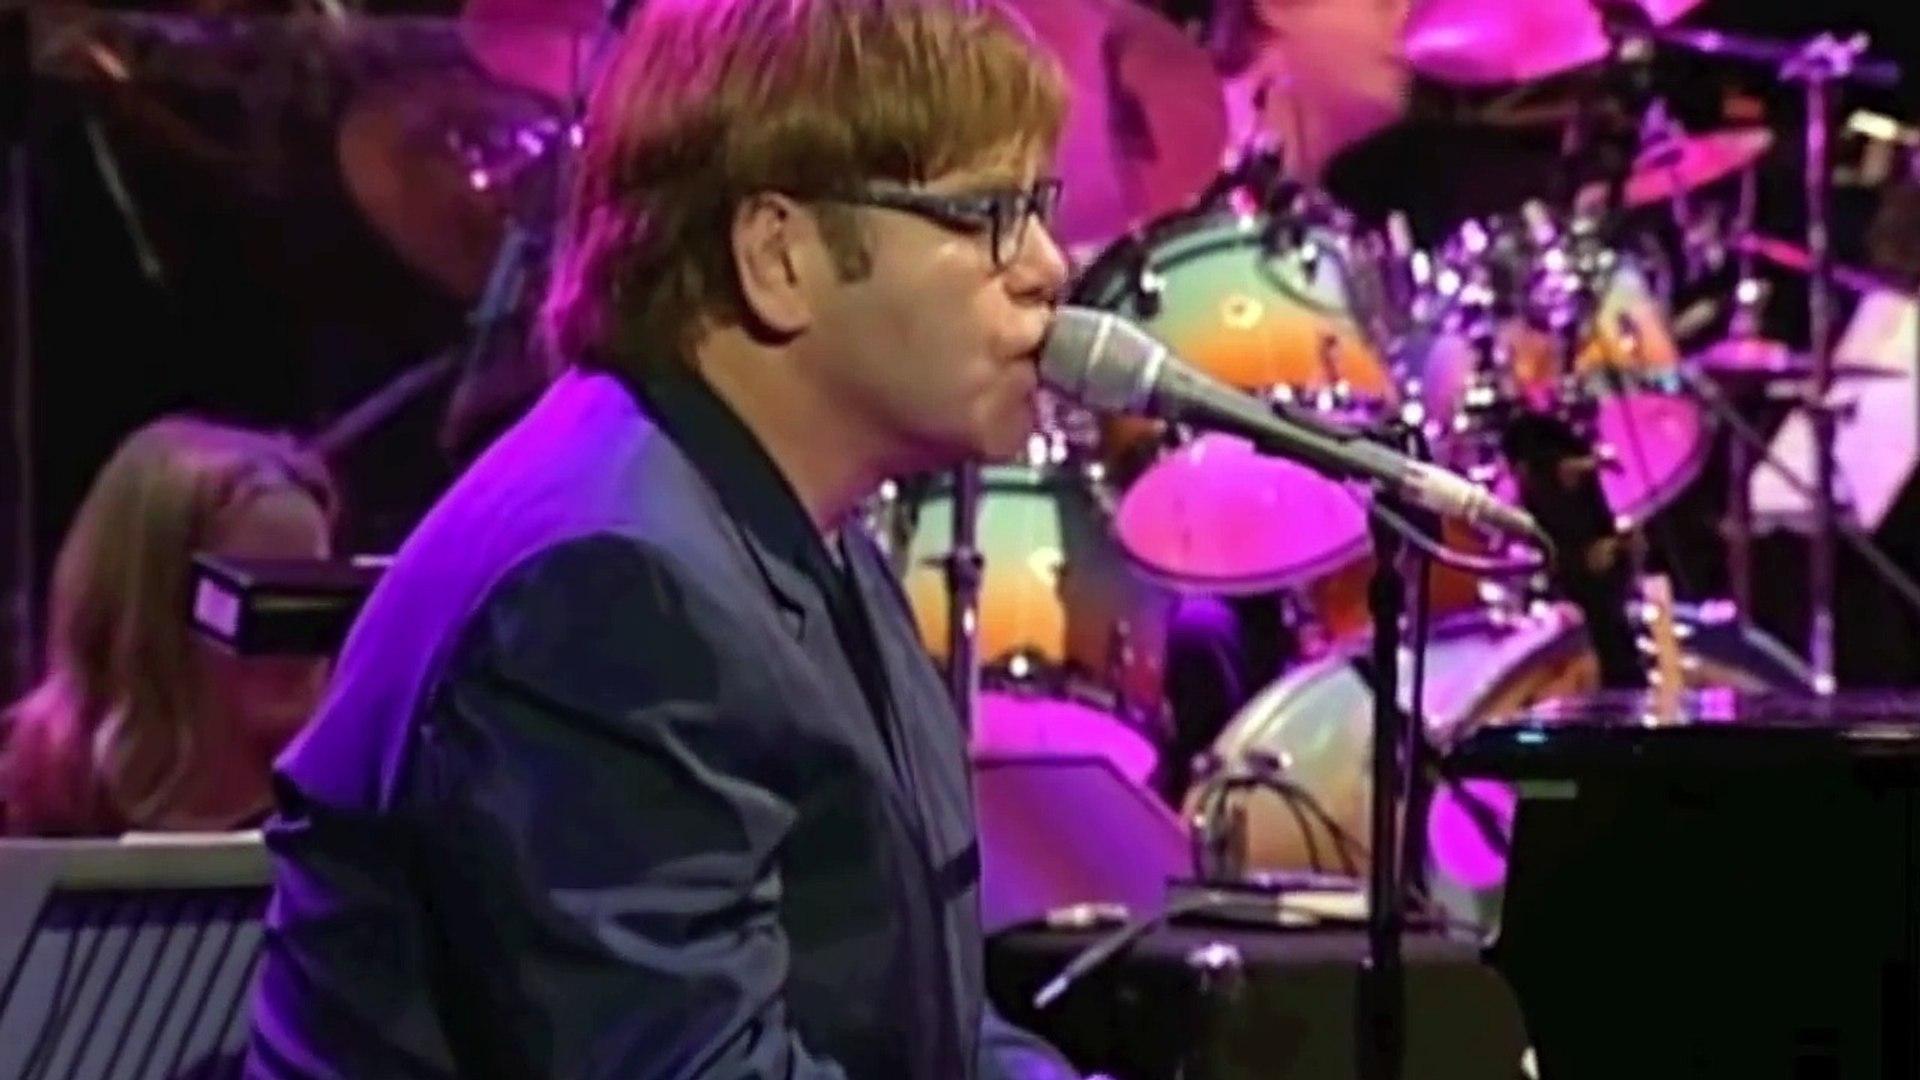 Hey Jude   Paul McCartney, Elton John, Eric Clapton, Sting, Phil Collins, Mark Knopfler, The Beatles